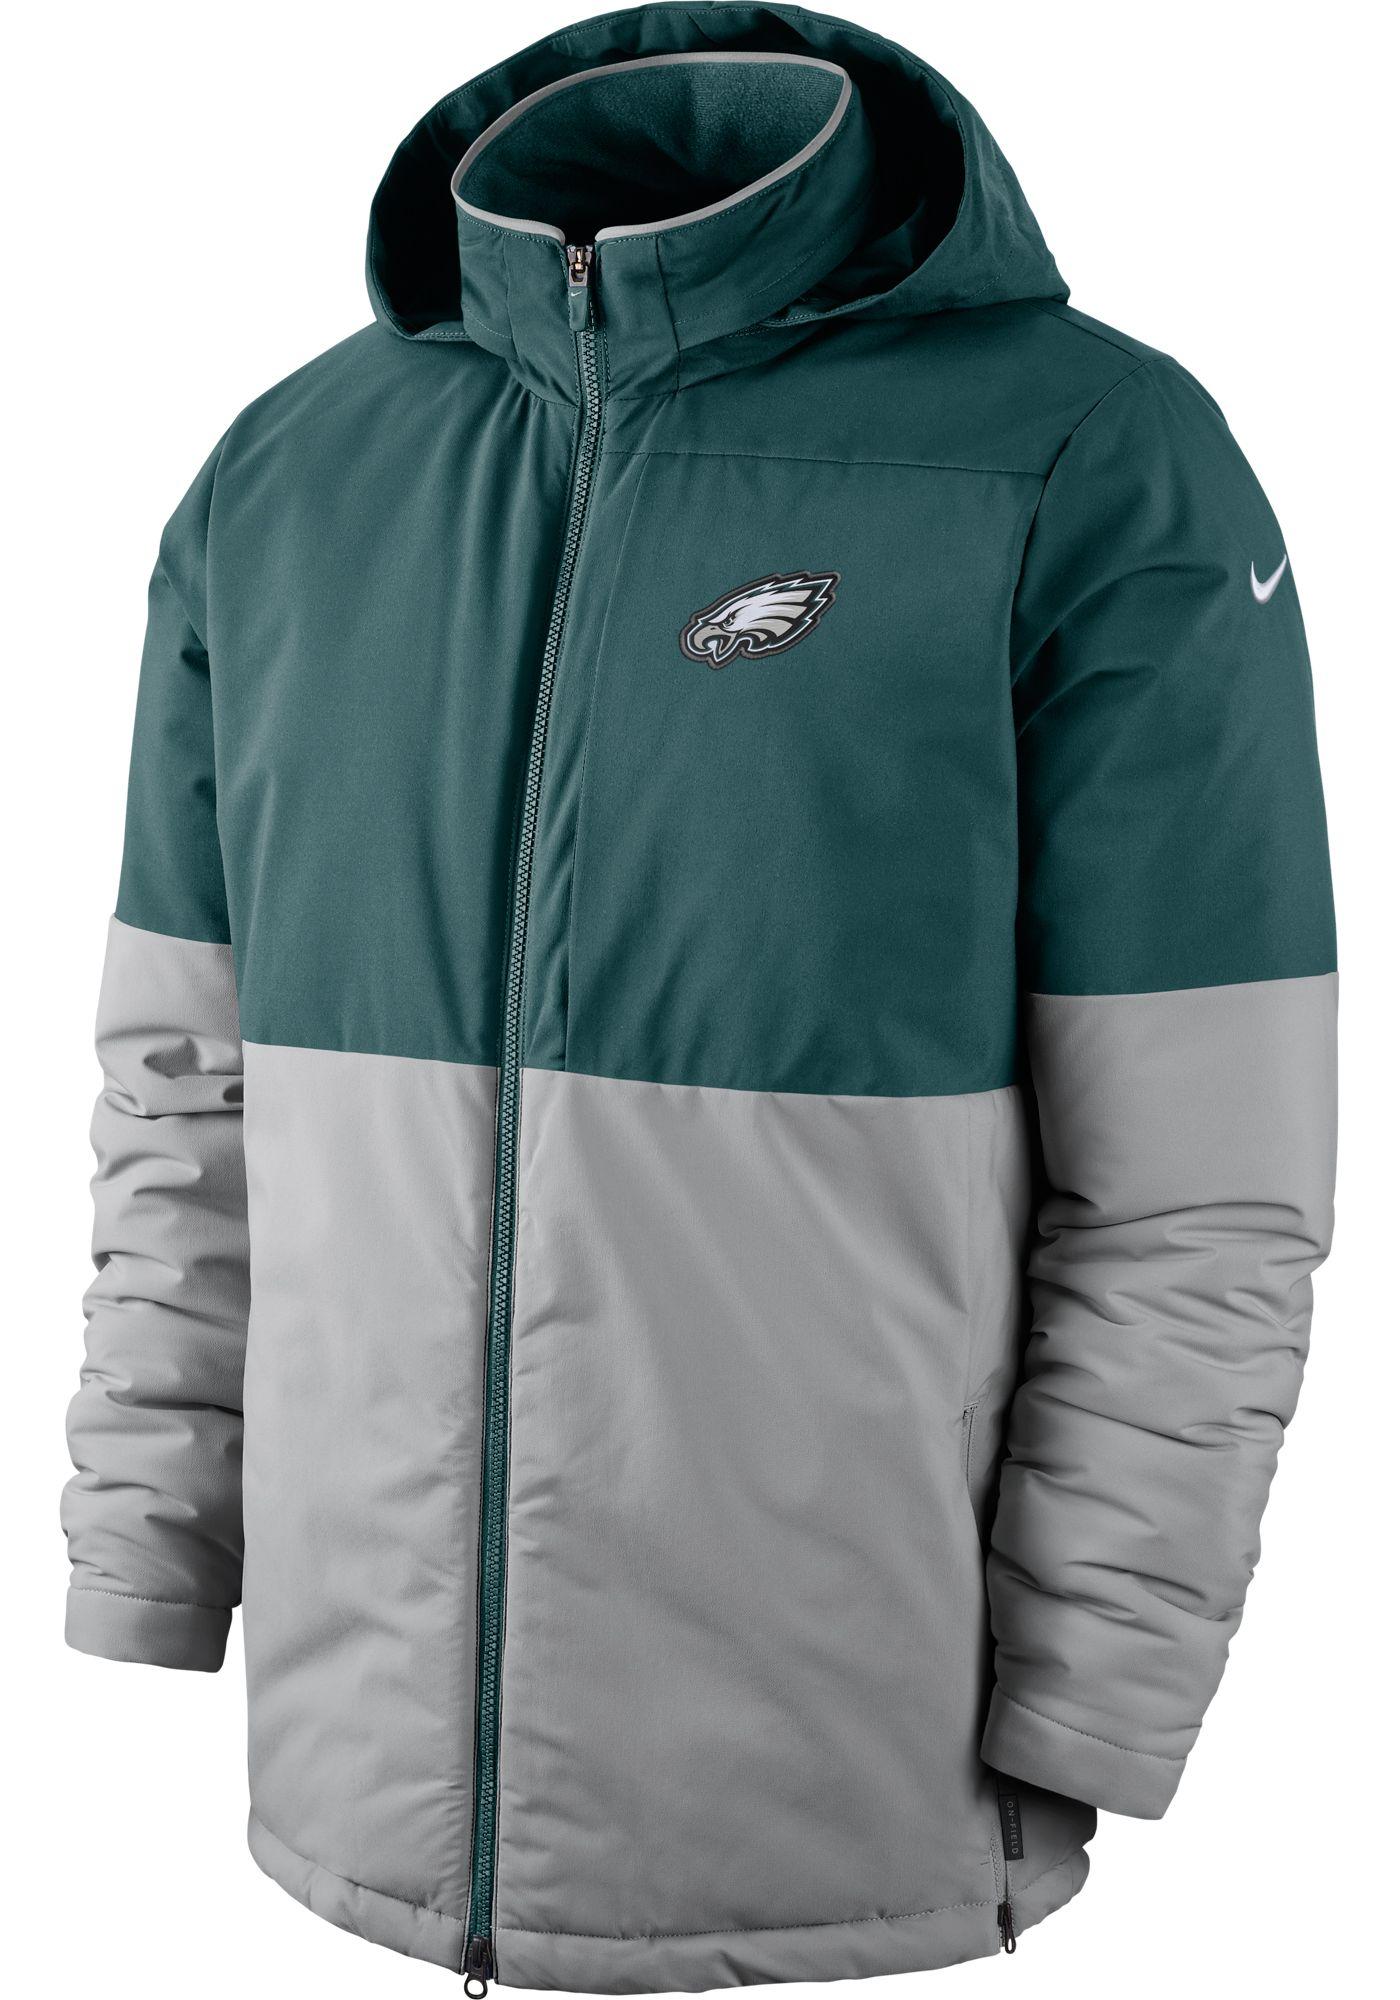 Nike Men's Philadelphia Eagles Sideline Green Heavy Jacket